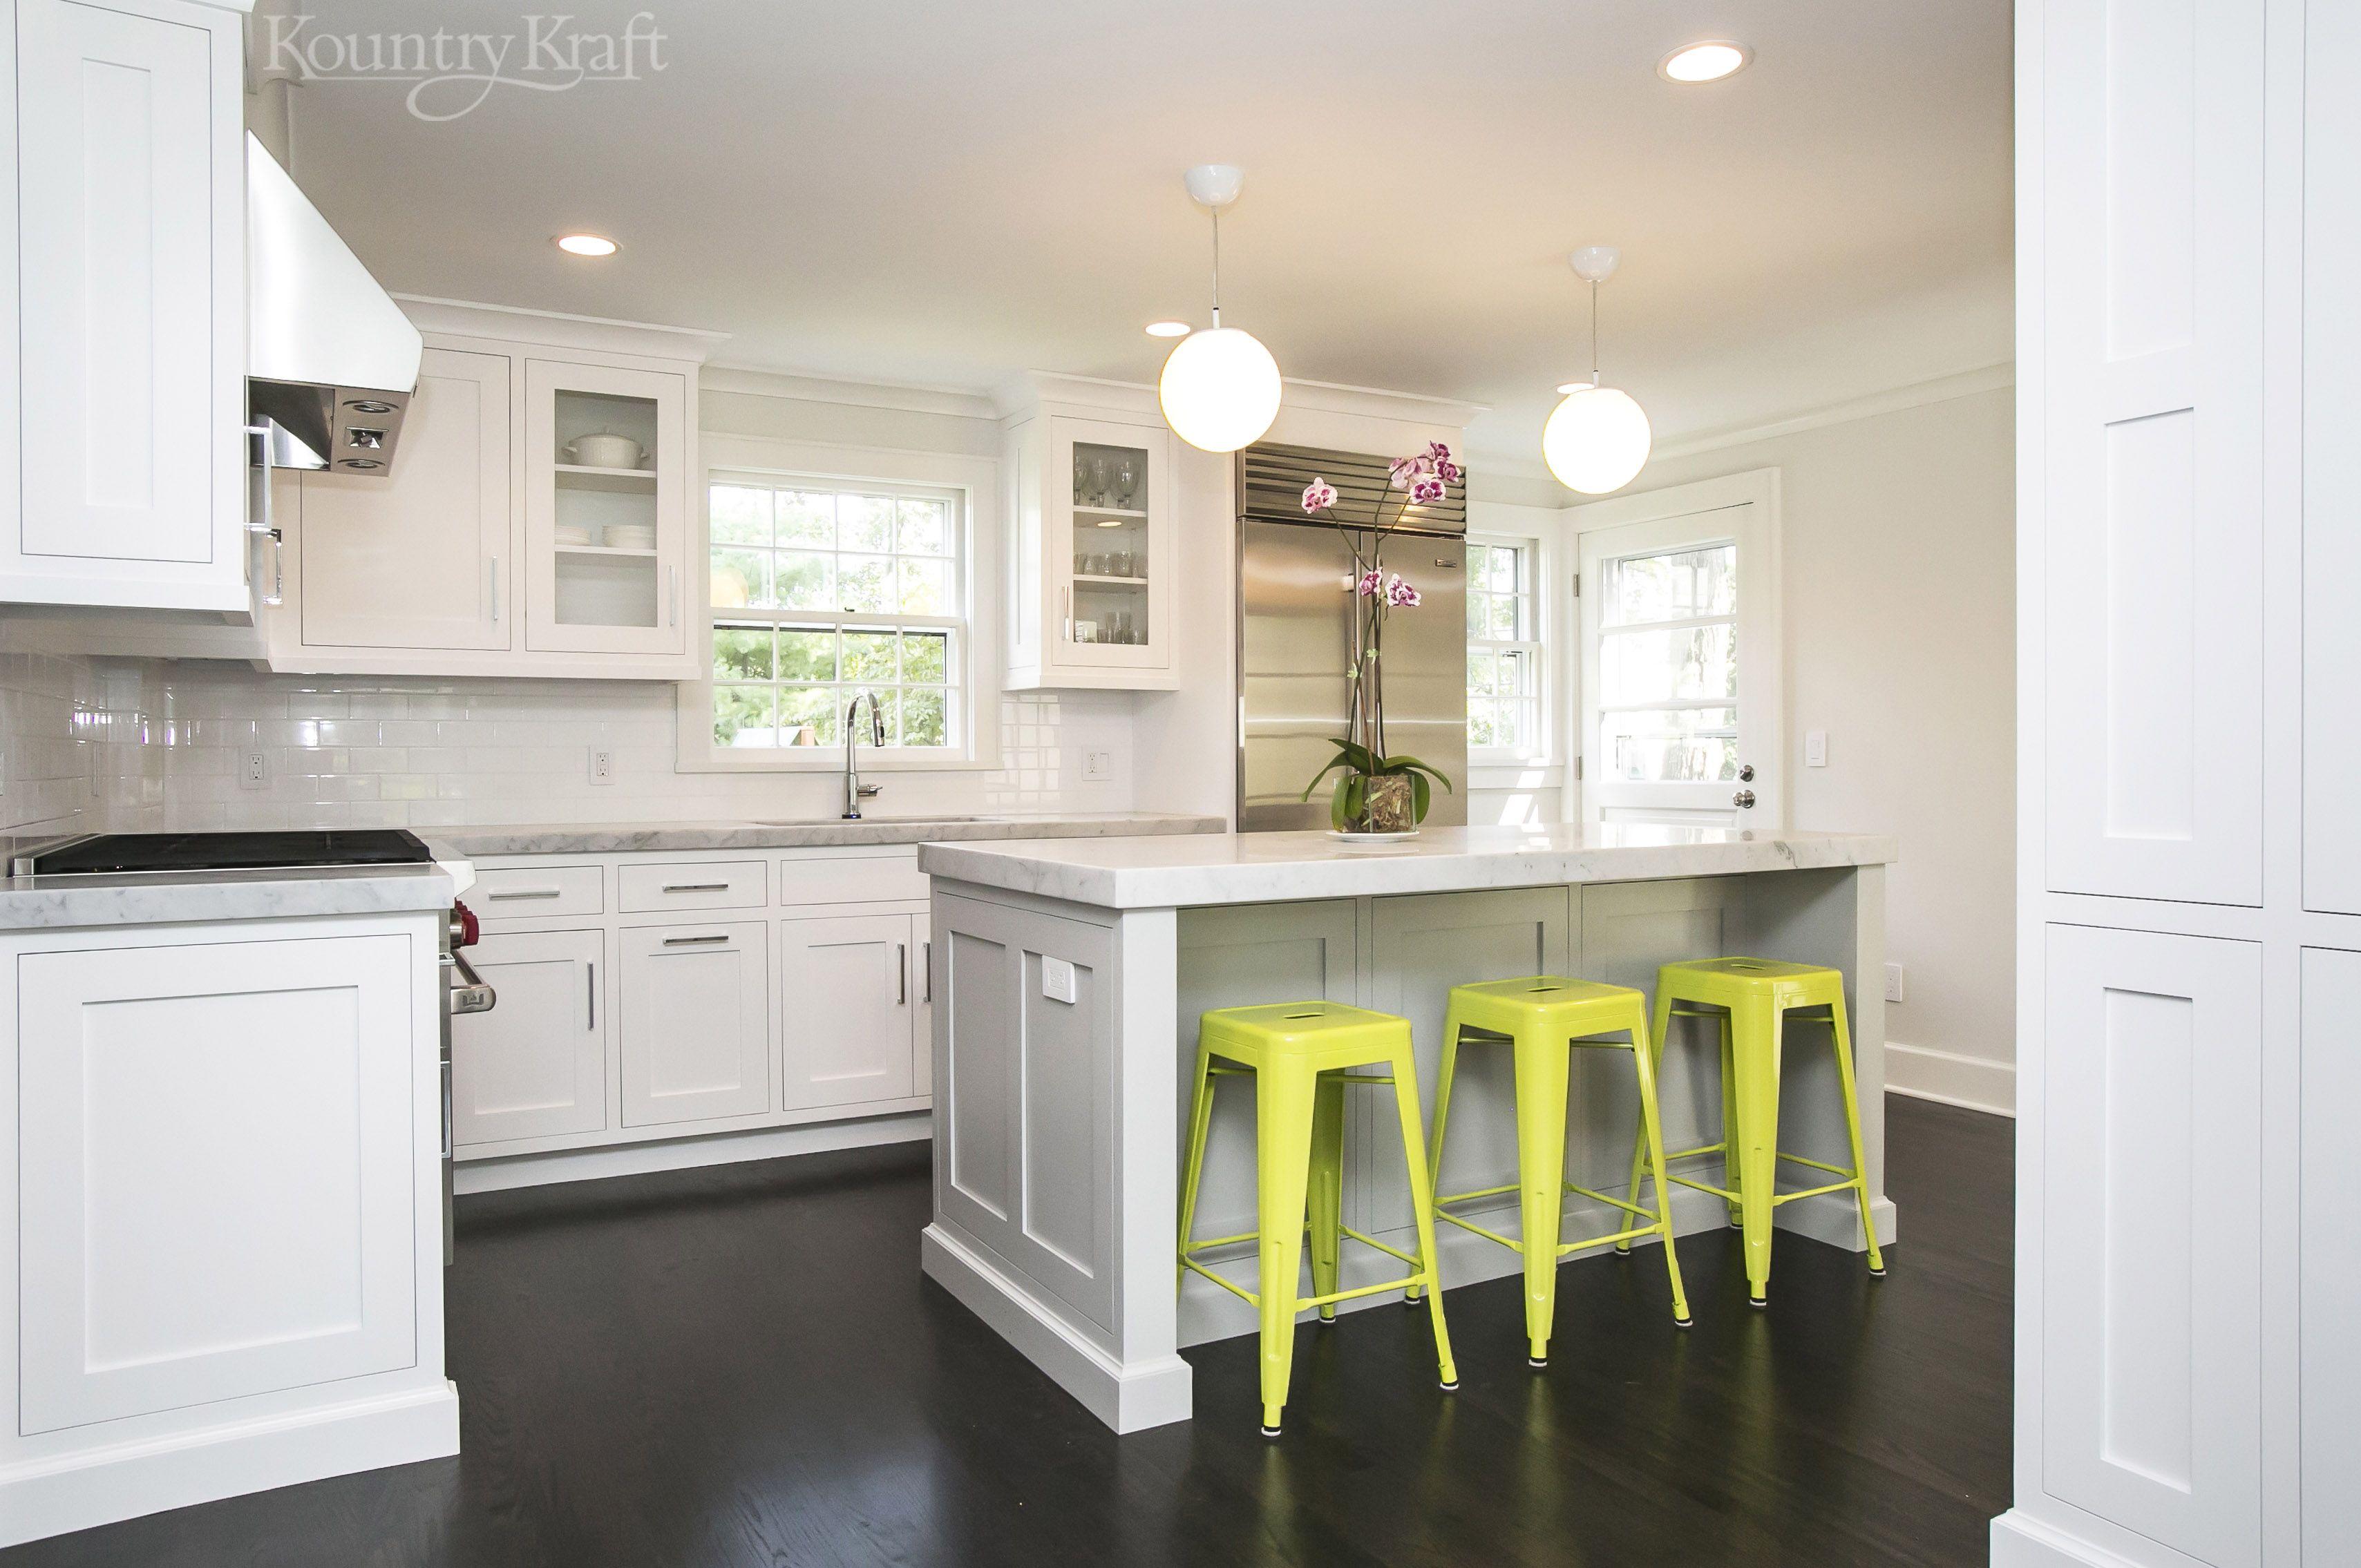 custom kitchen cabinets designedjustin sachs of